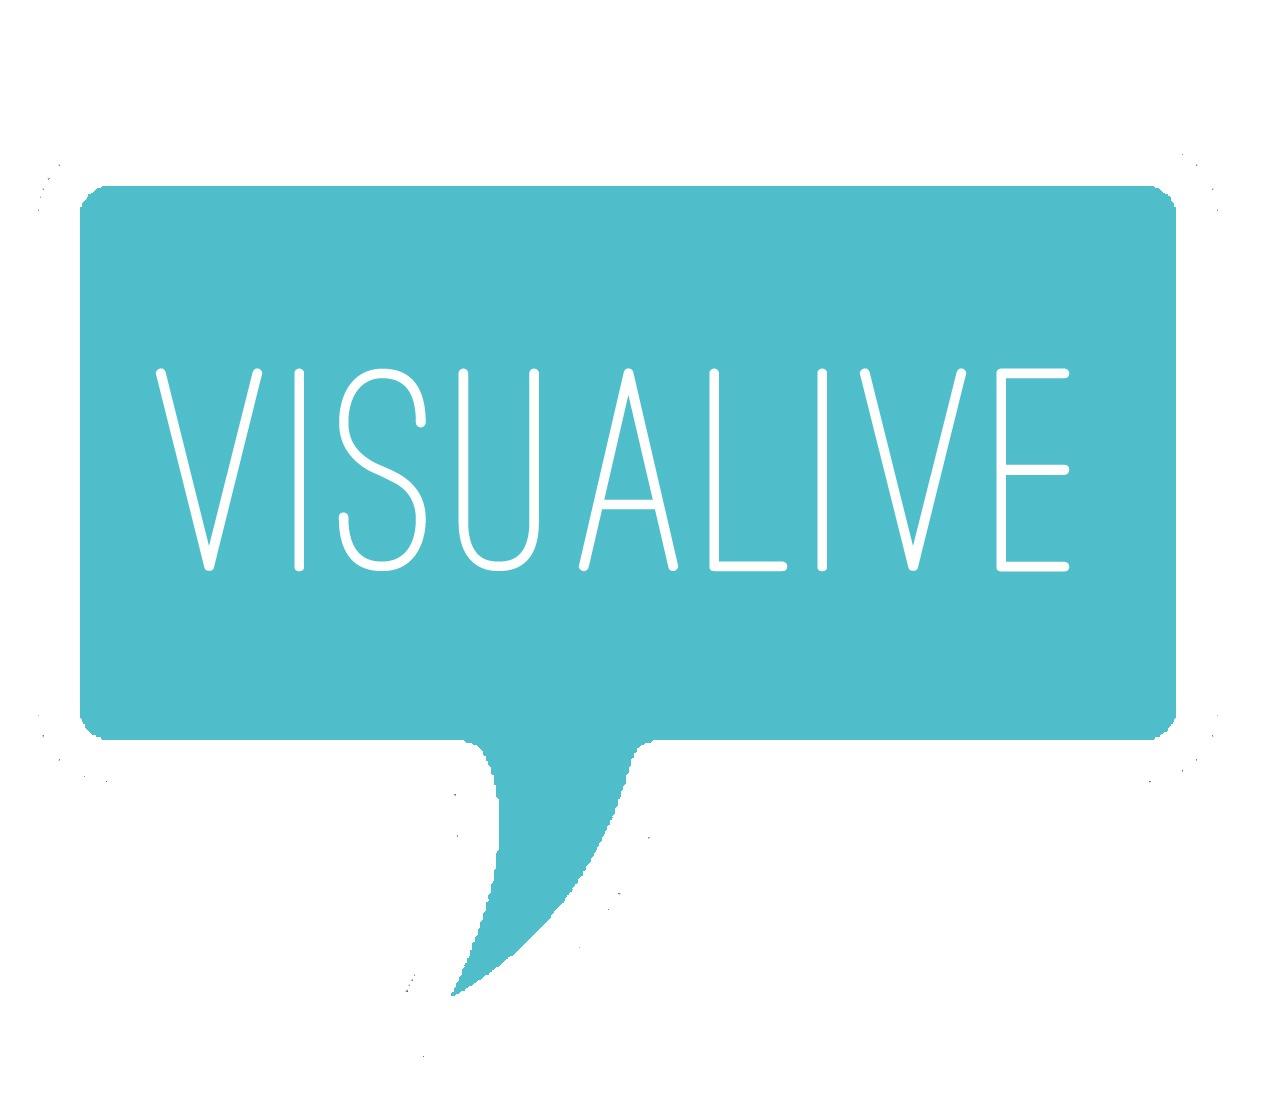 Visualive